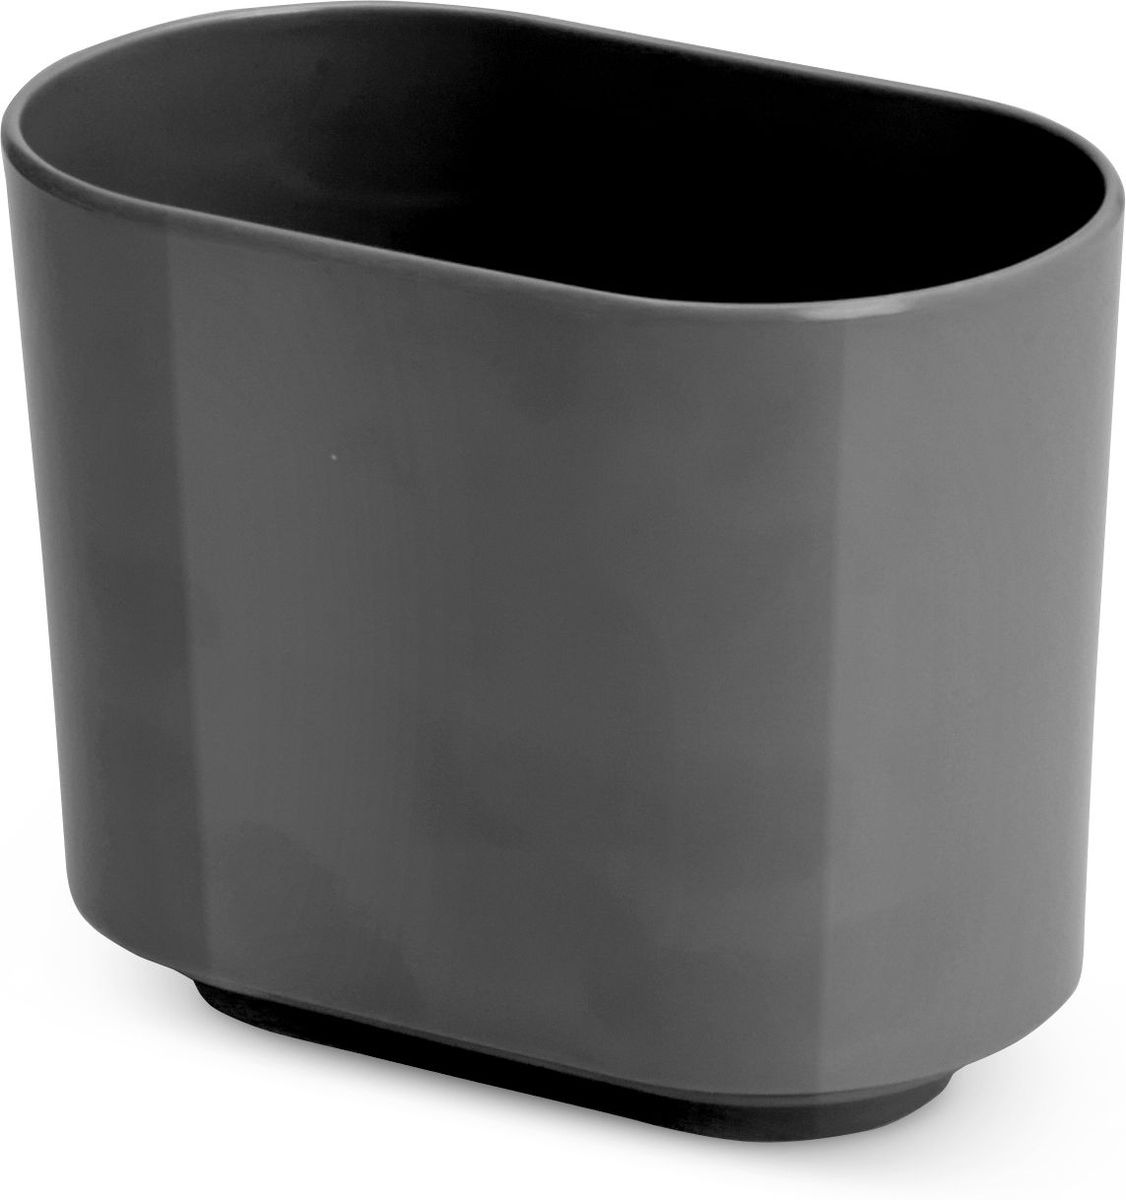 Стакан для зубных щеток Umbra Step, цвет: темно-серый, 7,5 х 10 х 12,5 см023836-149Стакан Umbra Step изготовленна из меламина. Эта вместительная подставка послужит для хранения зубных щеток всех членов семьи.Размер: 7,5 х 10 х 12,5 см.